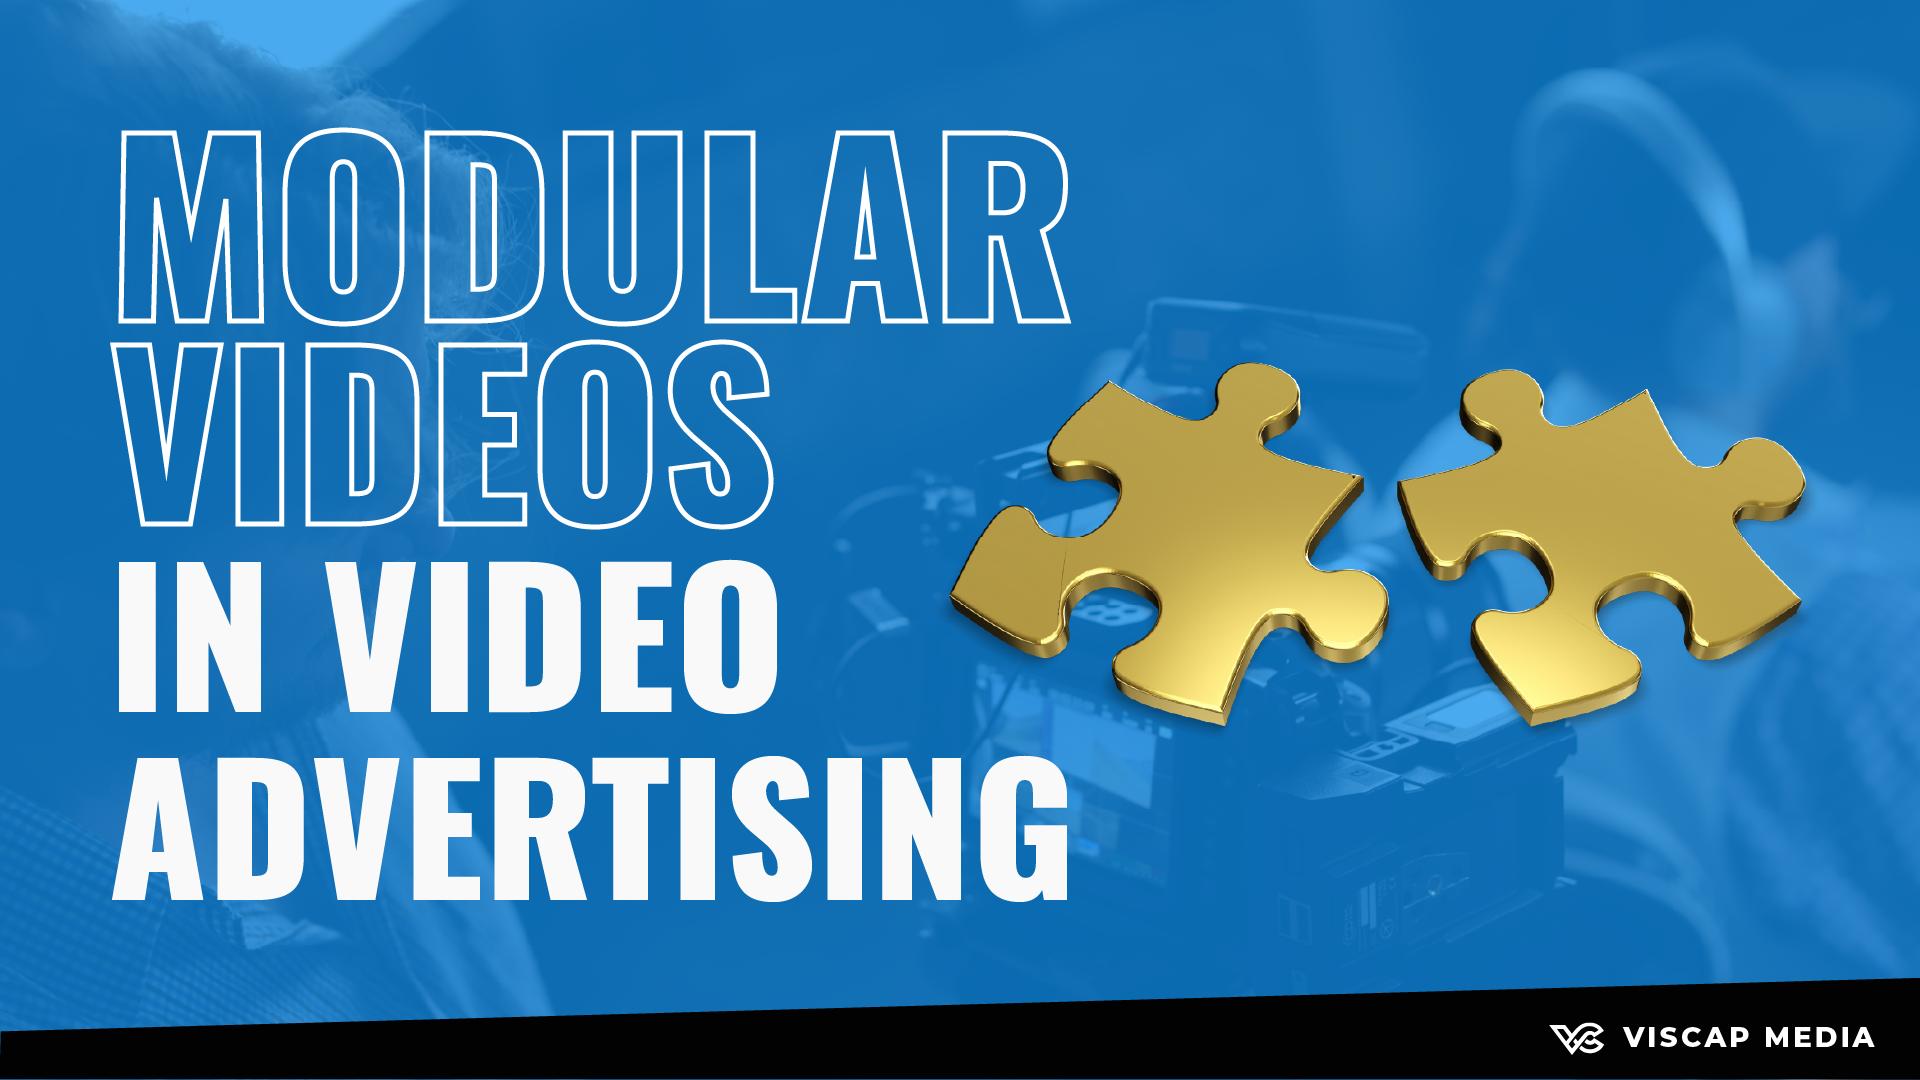 Modular Videos In Video Ads